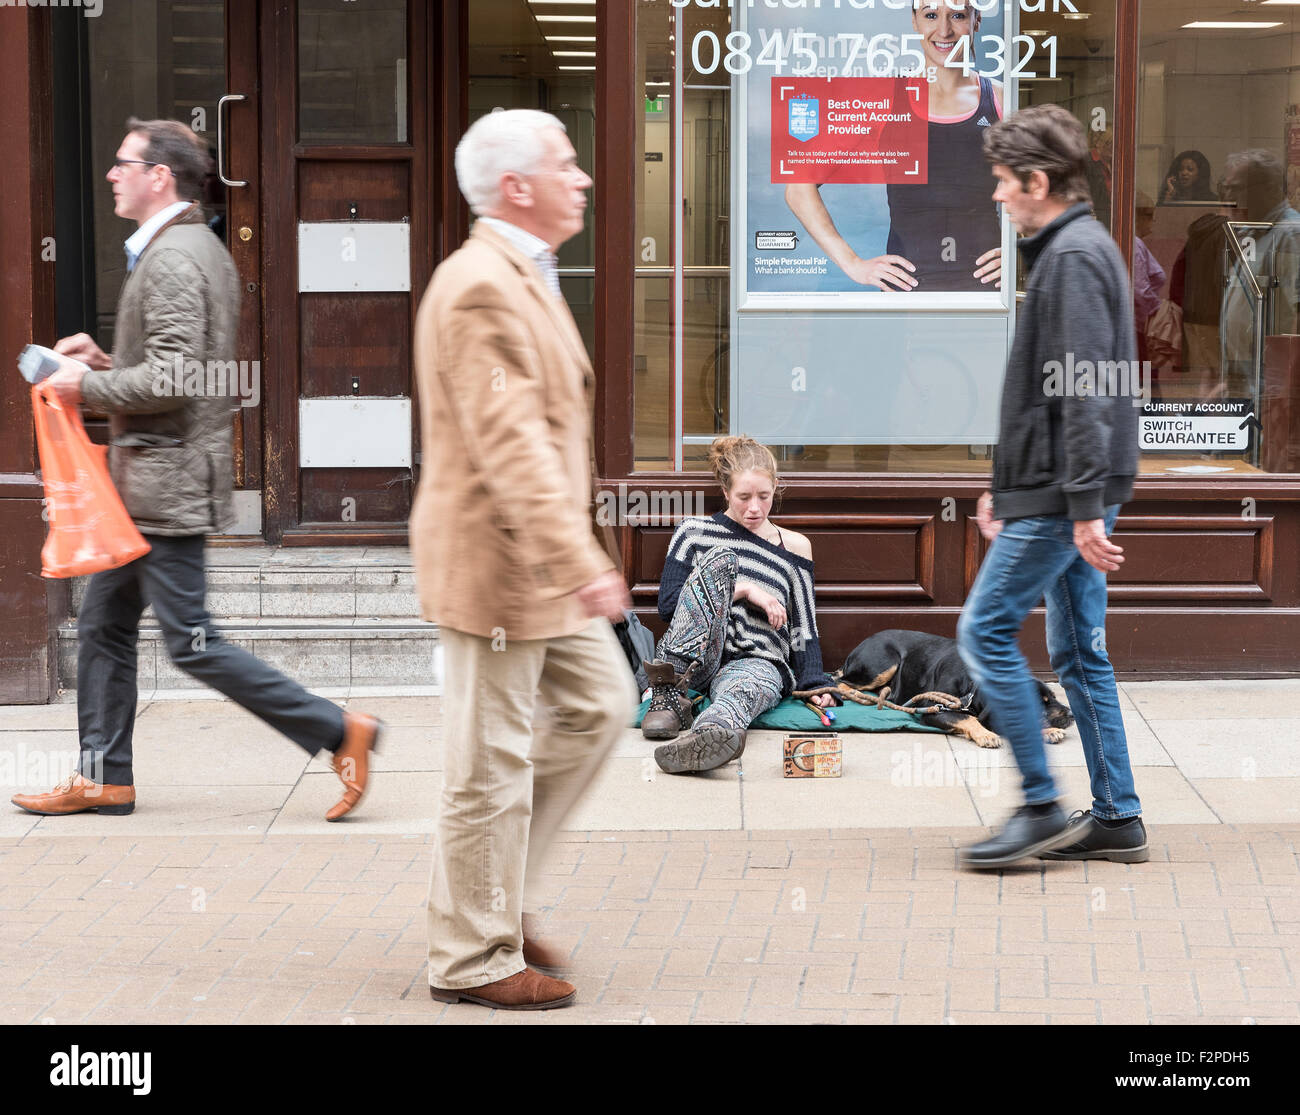 homeless-person-asleep-on-the-street-cambridge-cambridgeshire-england-F2PDH5.jpg